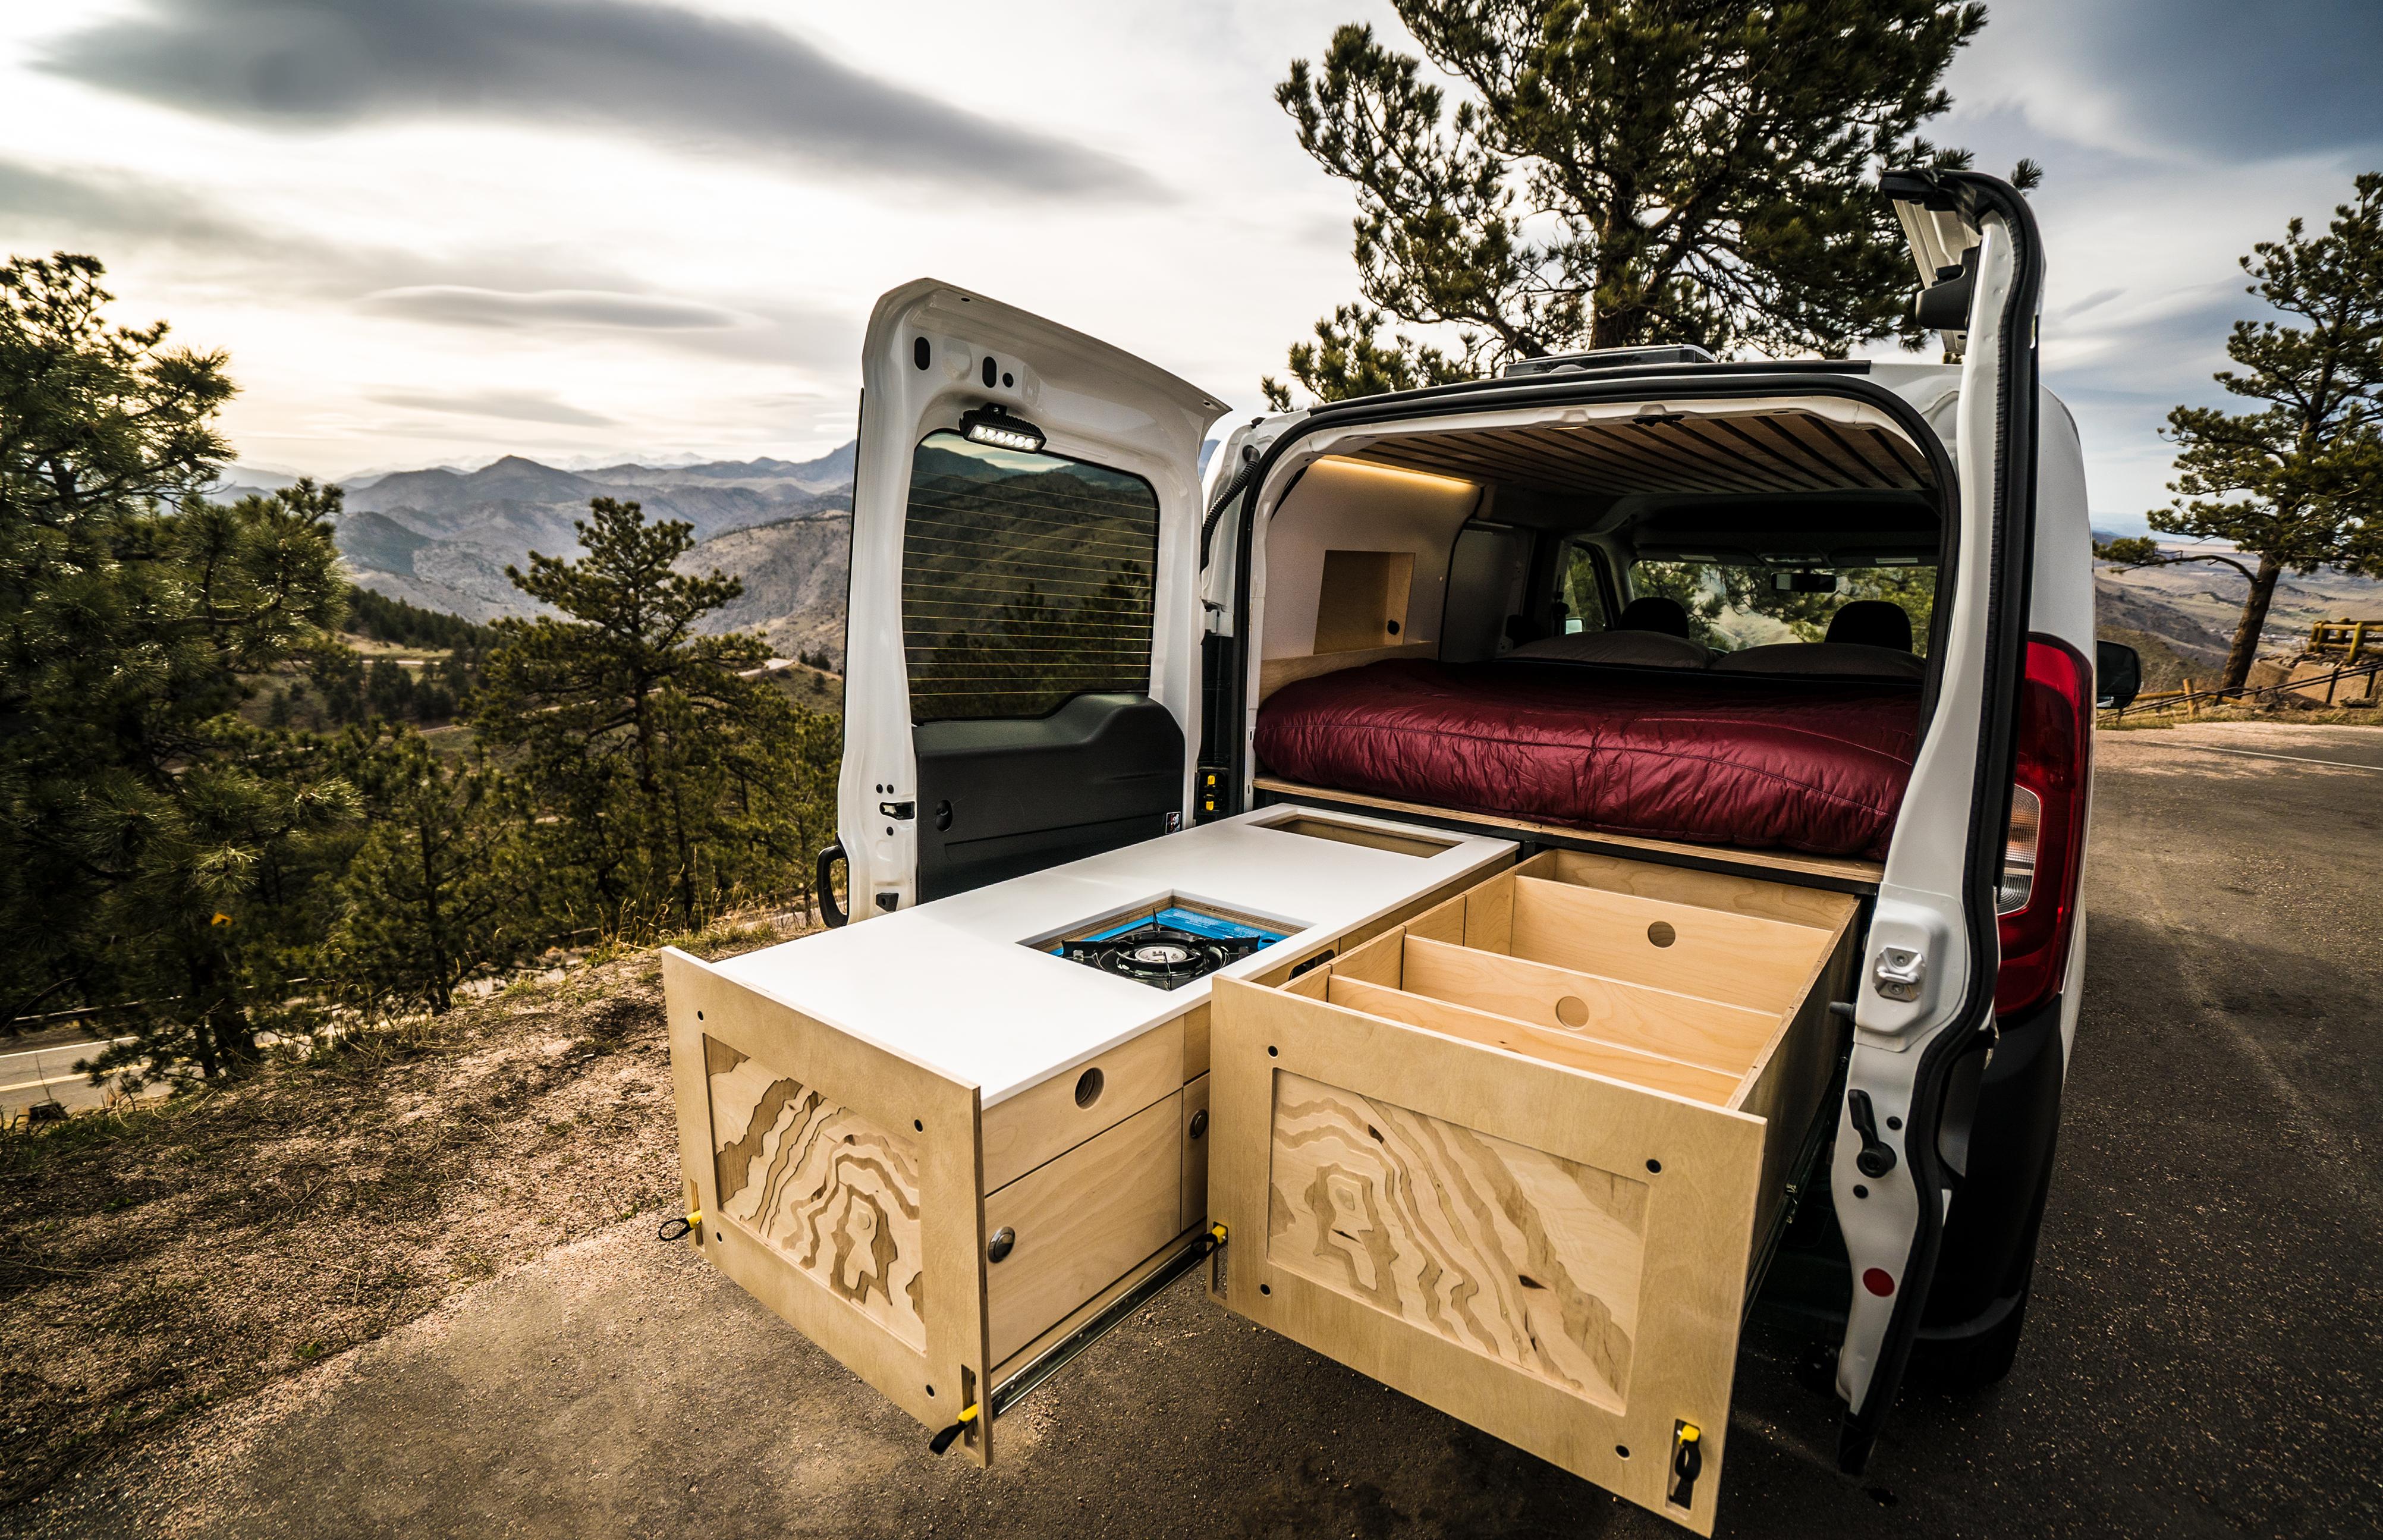 DIY camper van: 5 affordable conversion kits you can buy now